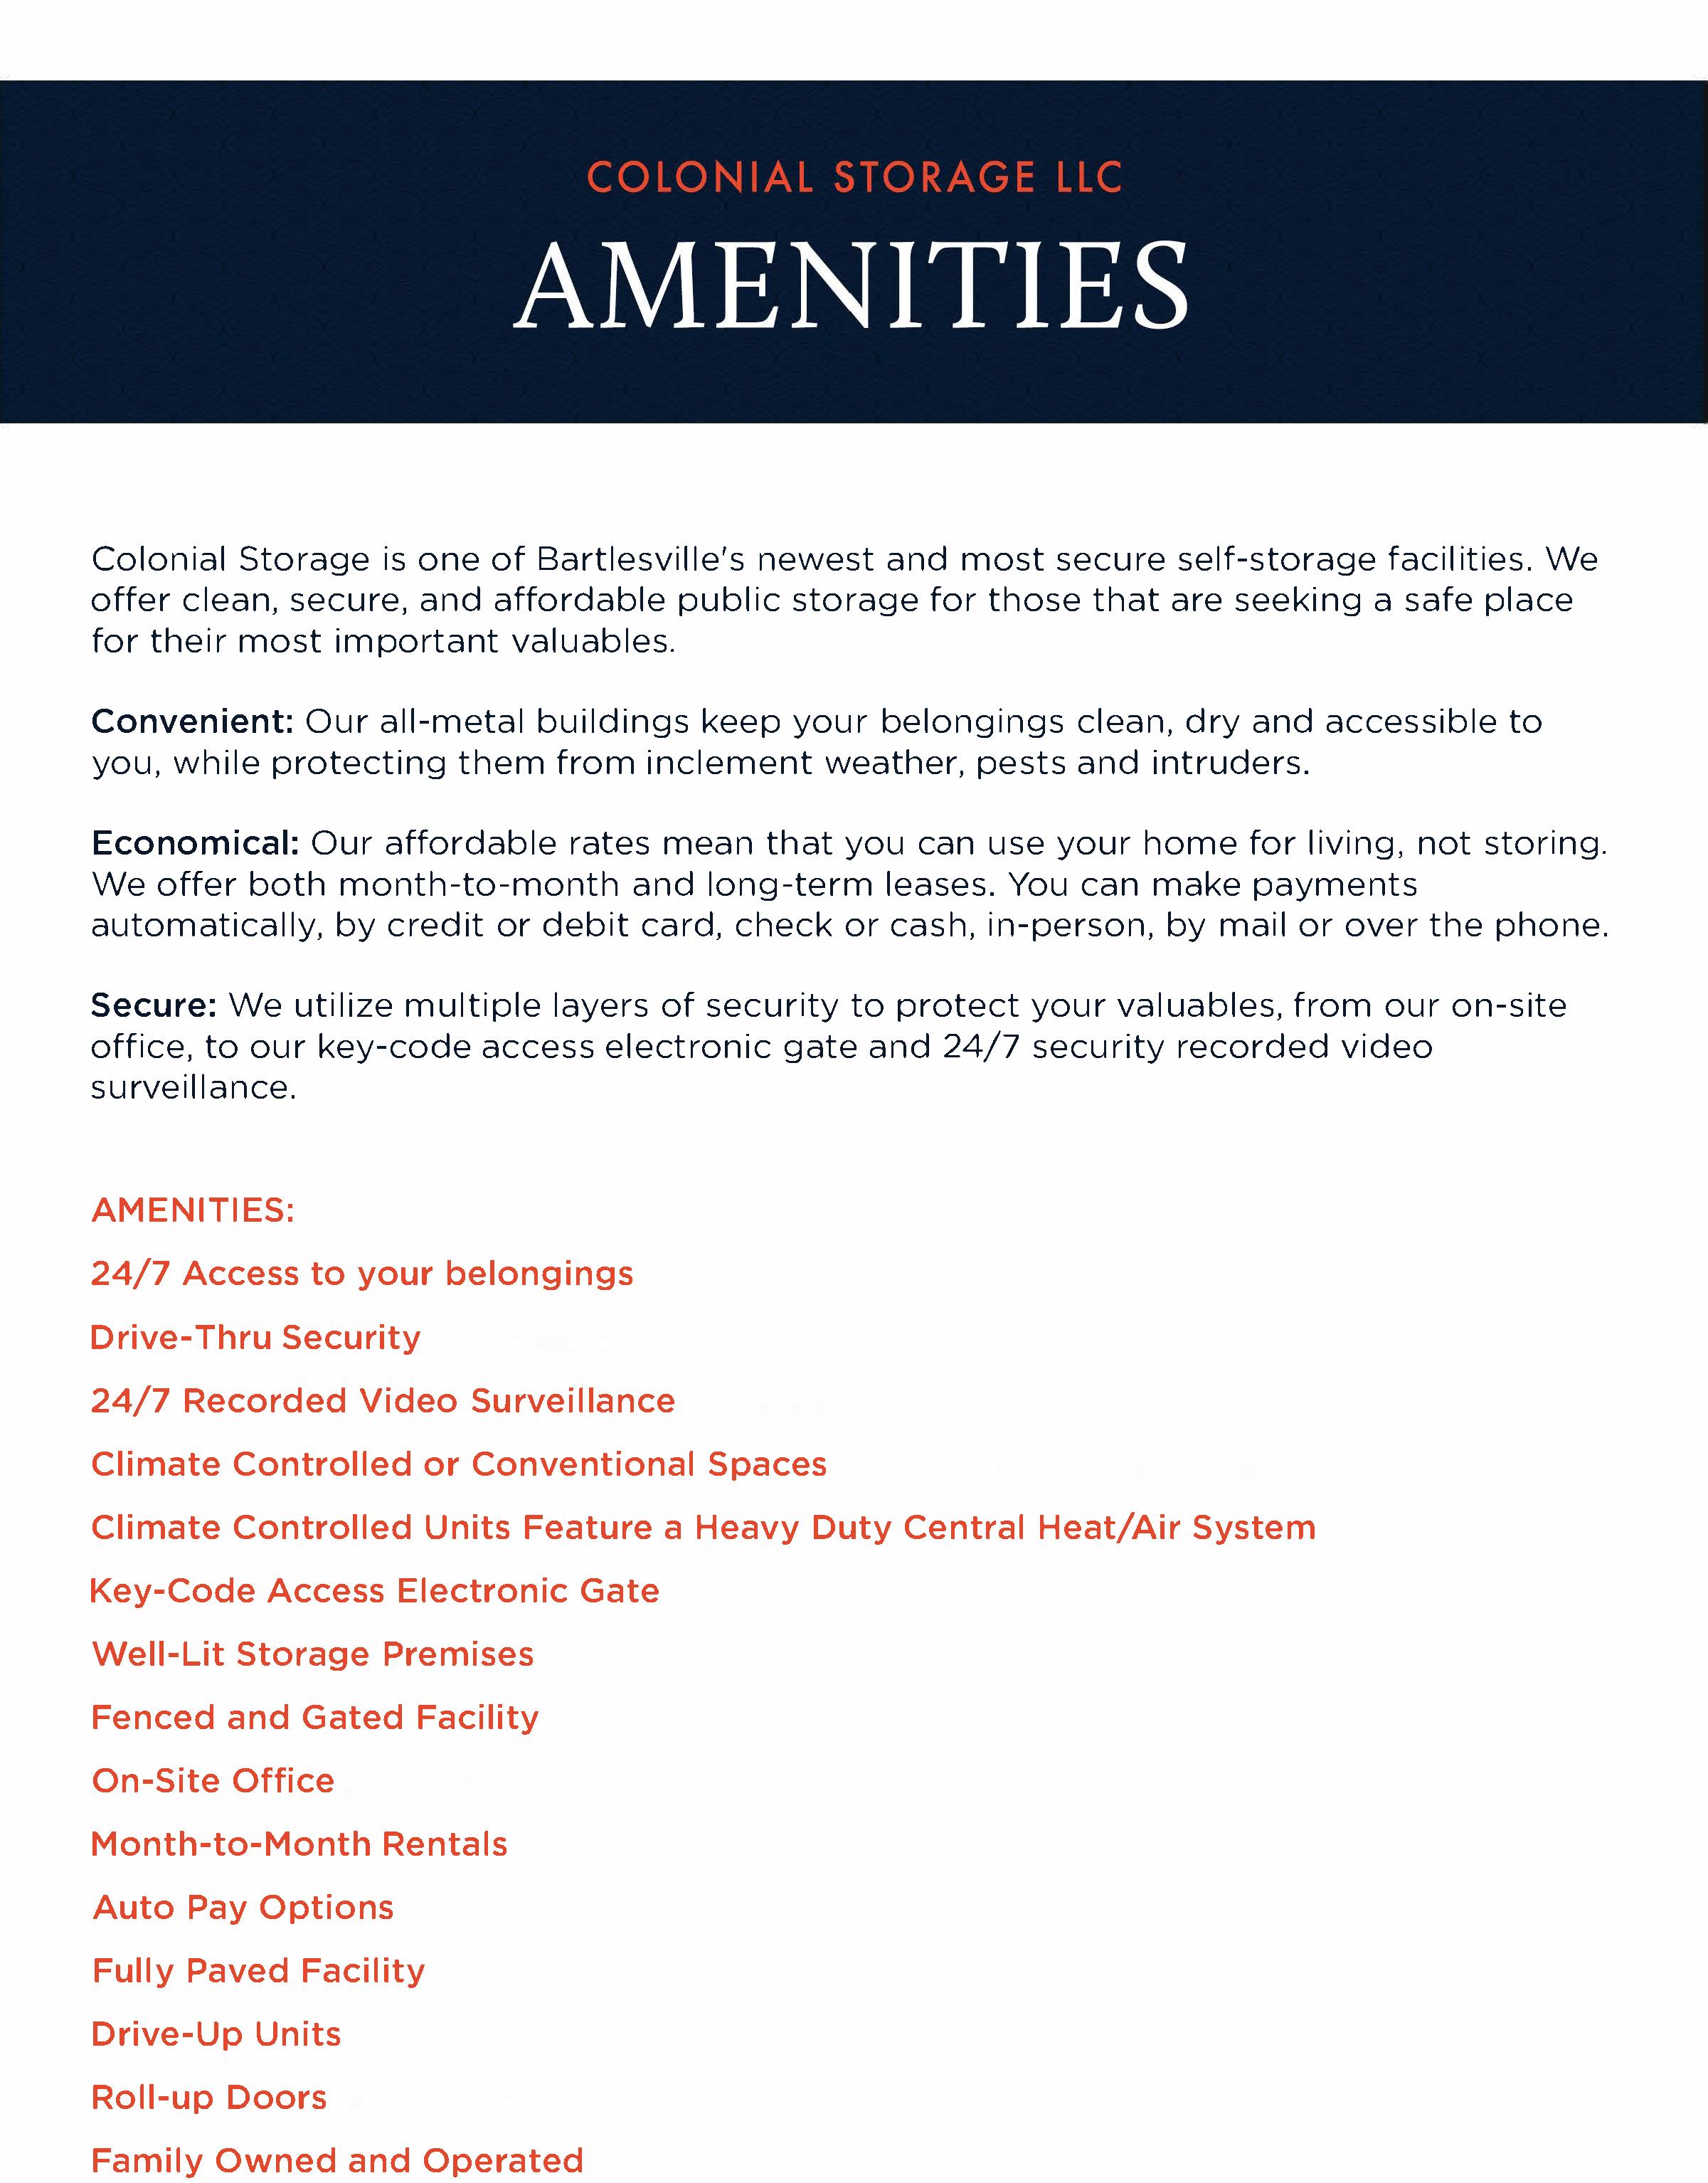 colonialstorage_amenities.png